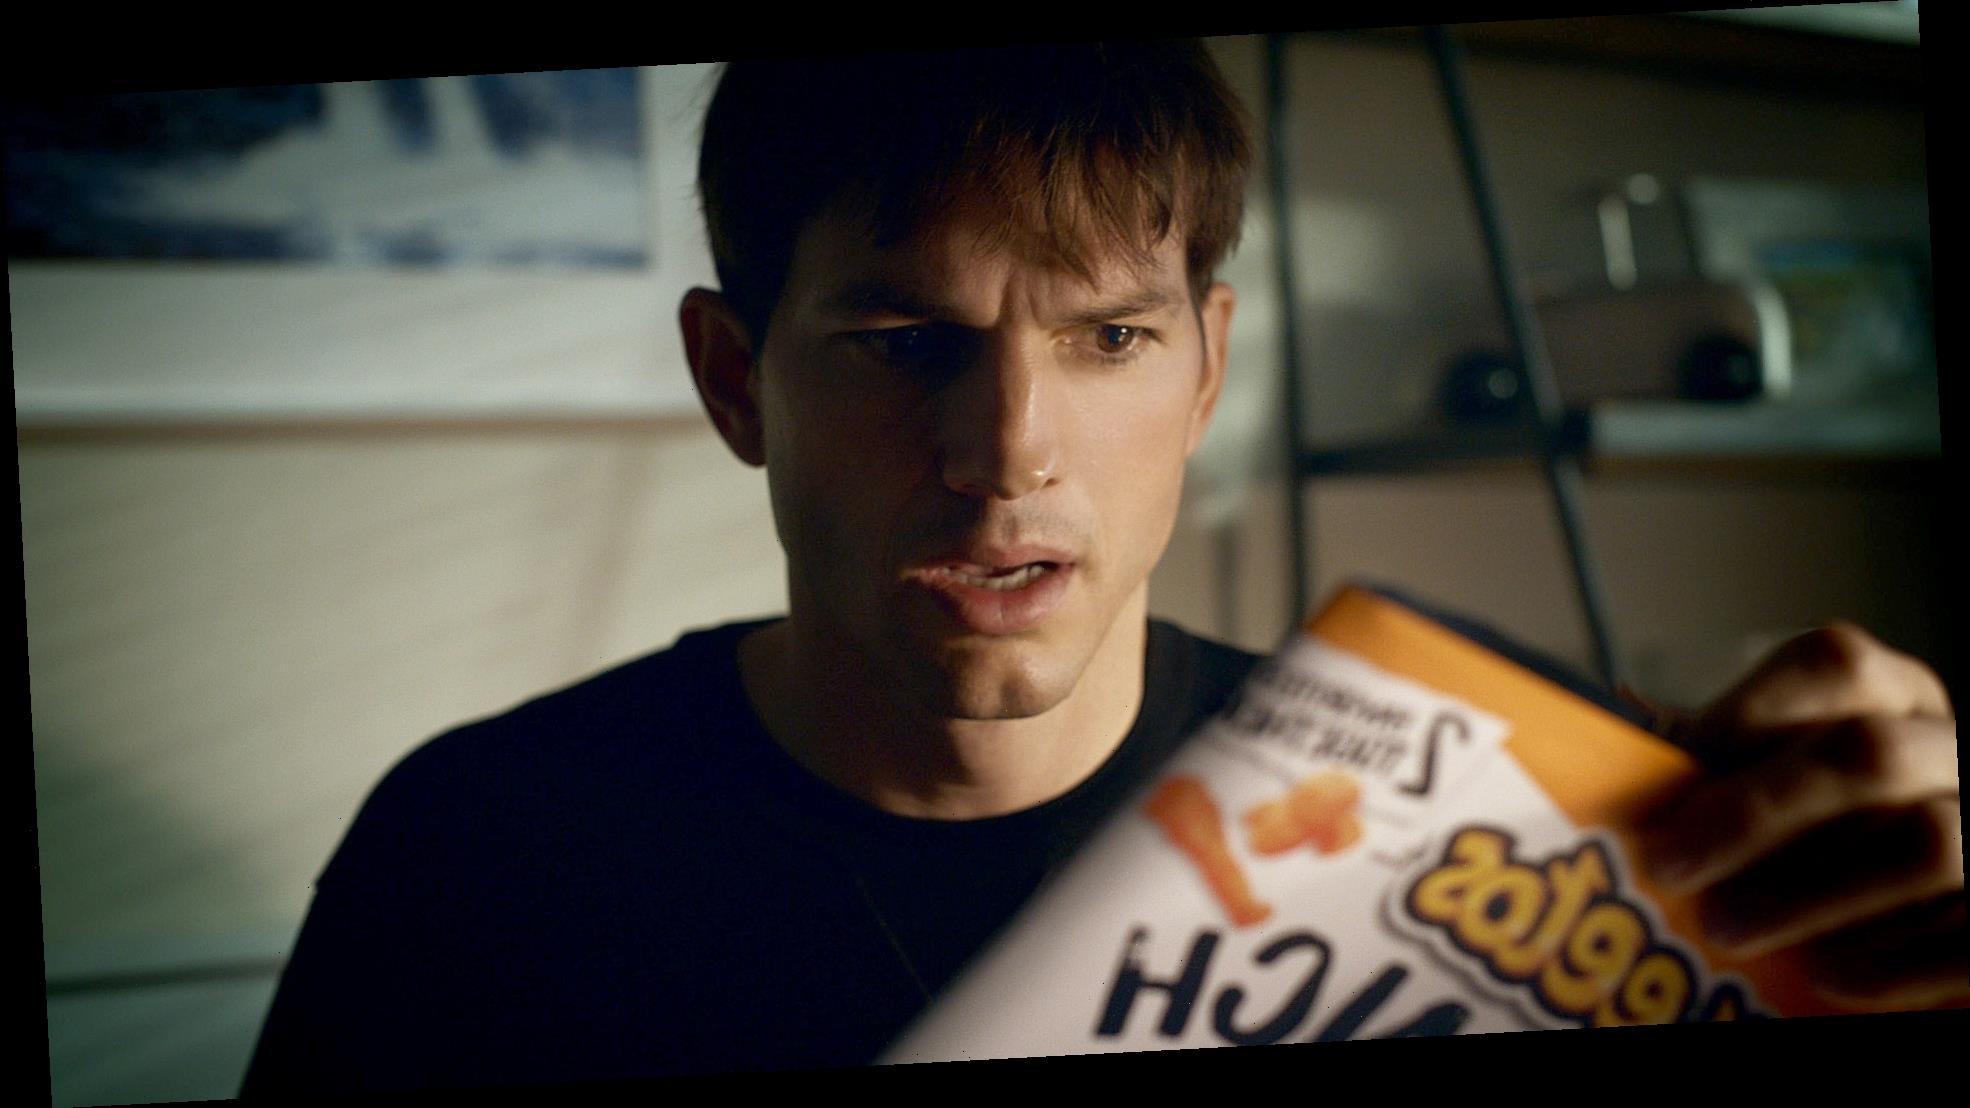 Ashton Kutcher Stars in New Cheetos Super Bowl Ad Teaser: Watch